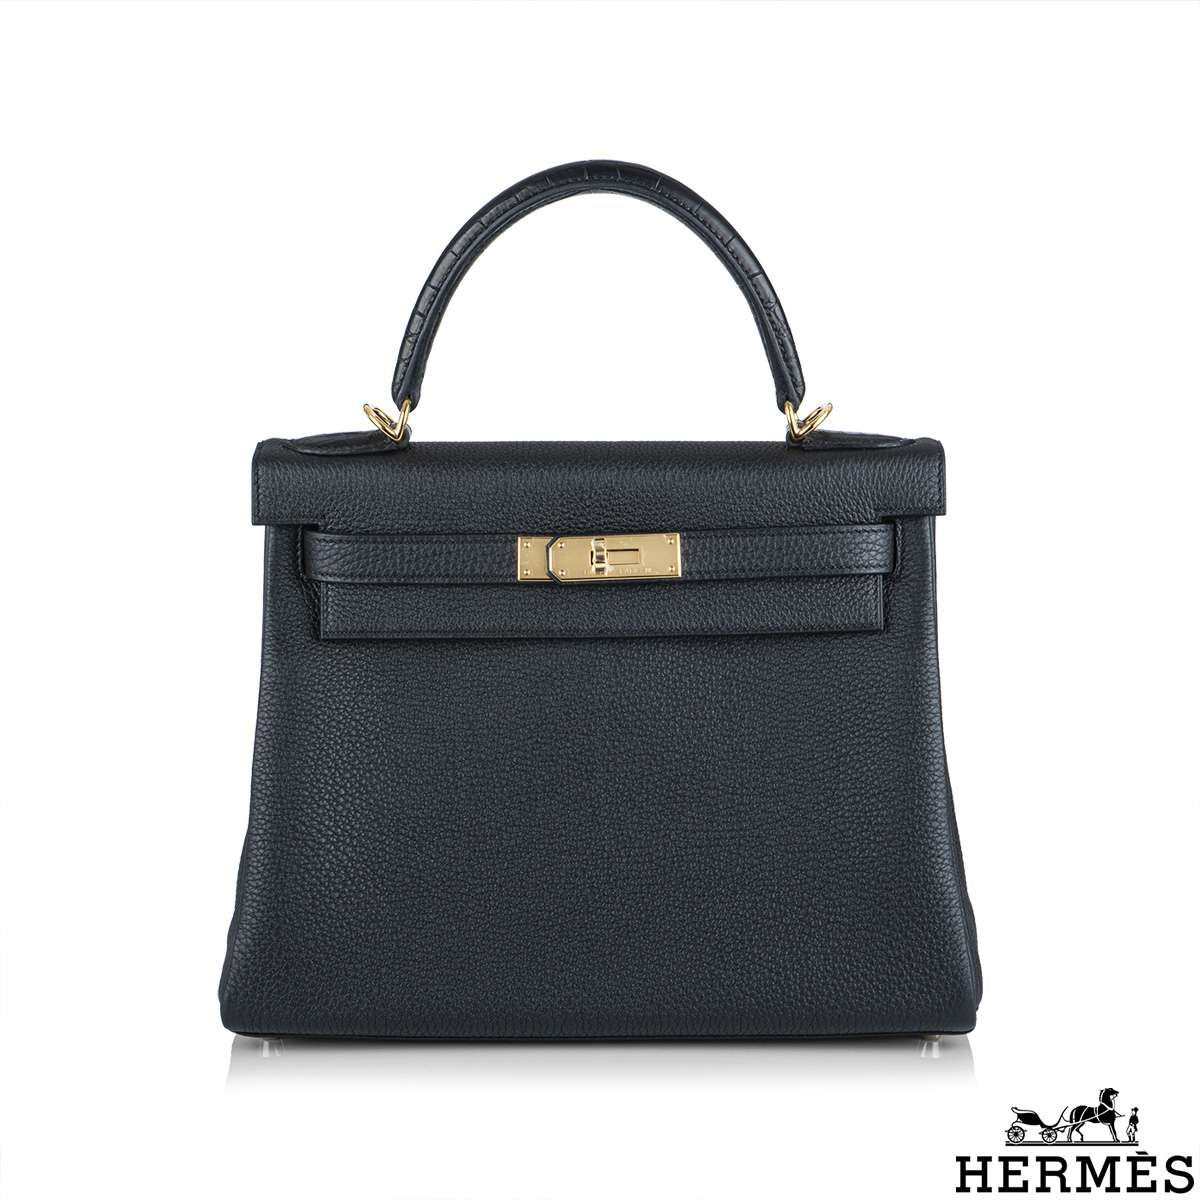 Hermès Kelly Touch 28 cm Noir Matte Alligator and Noir Togo GHW